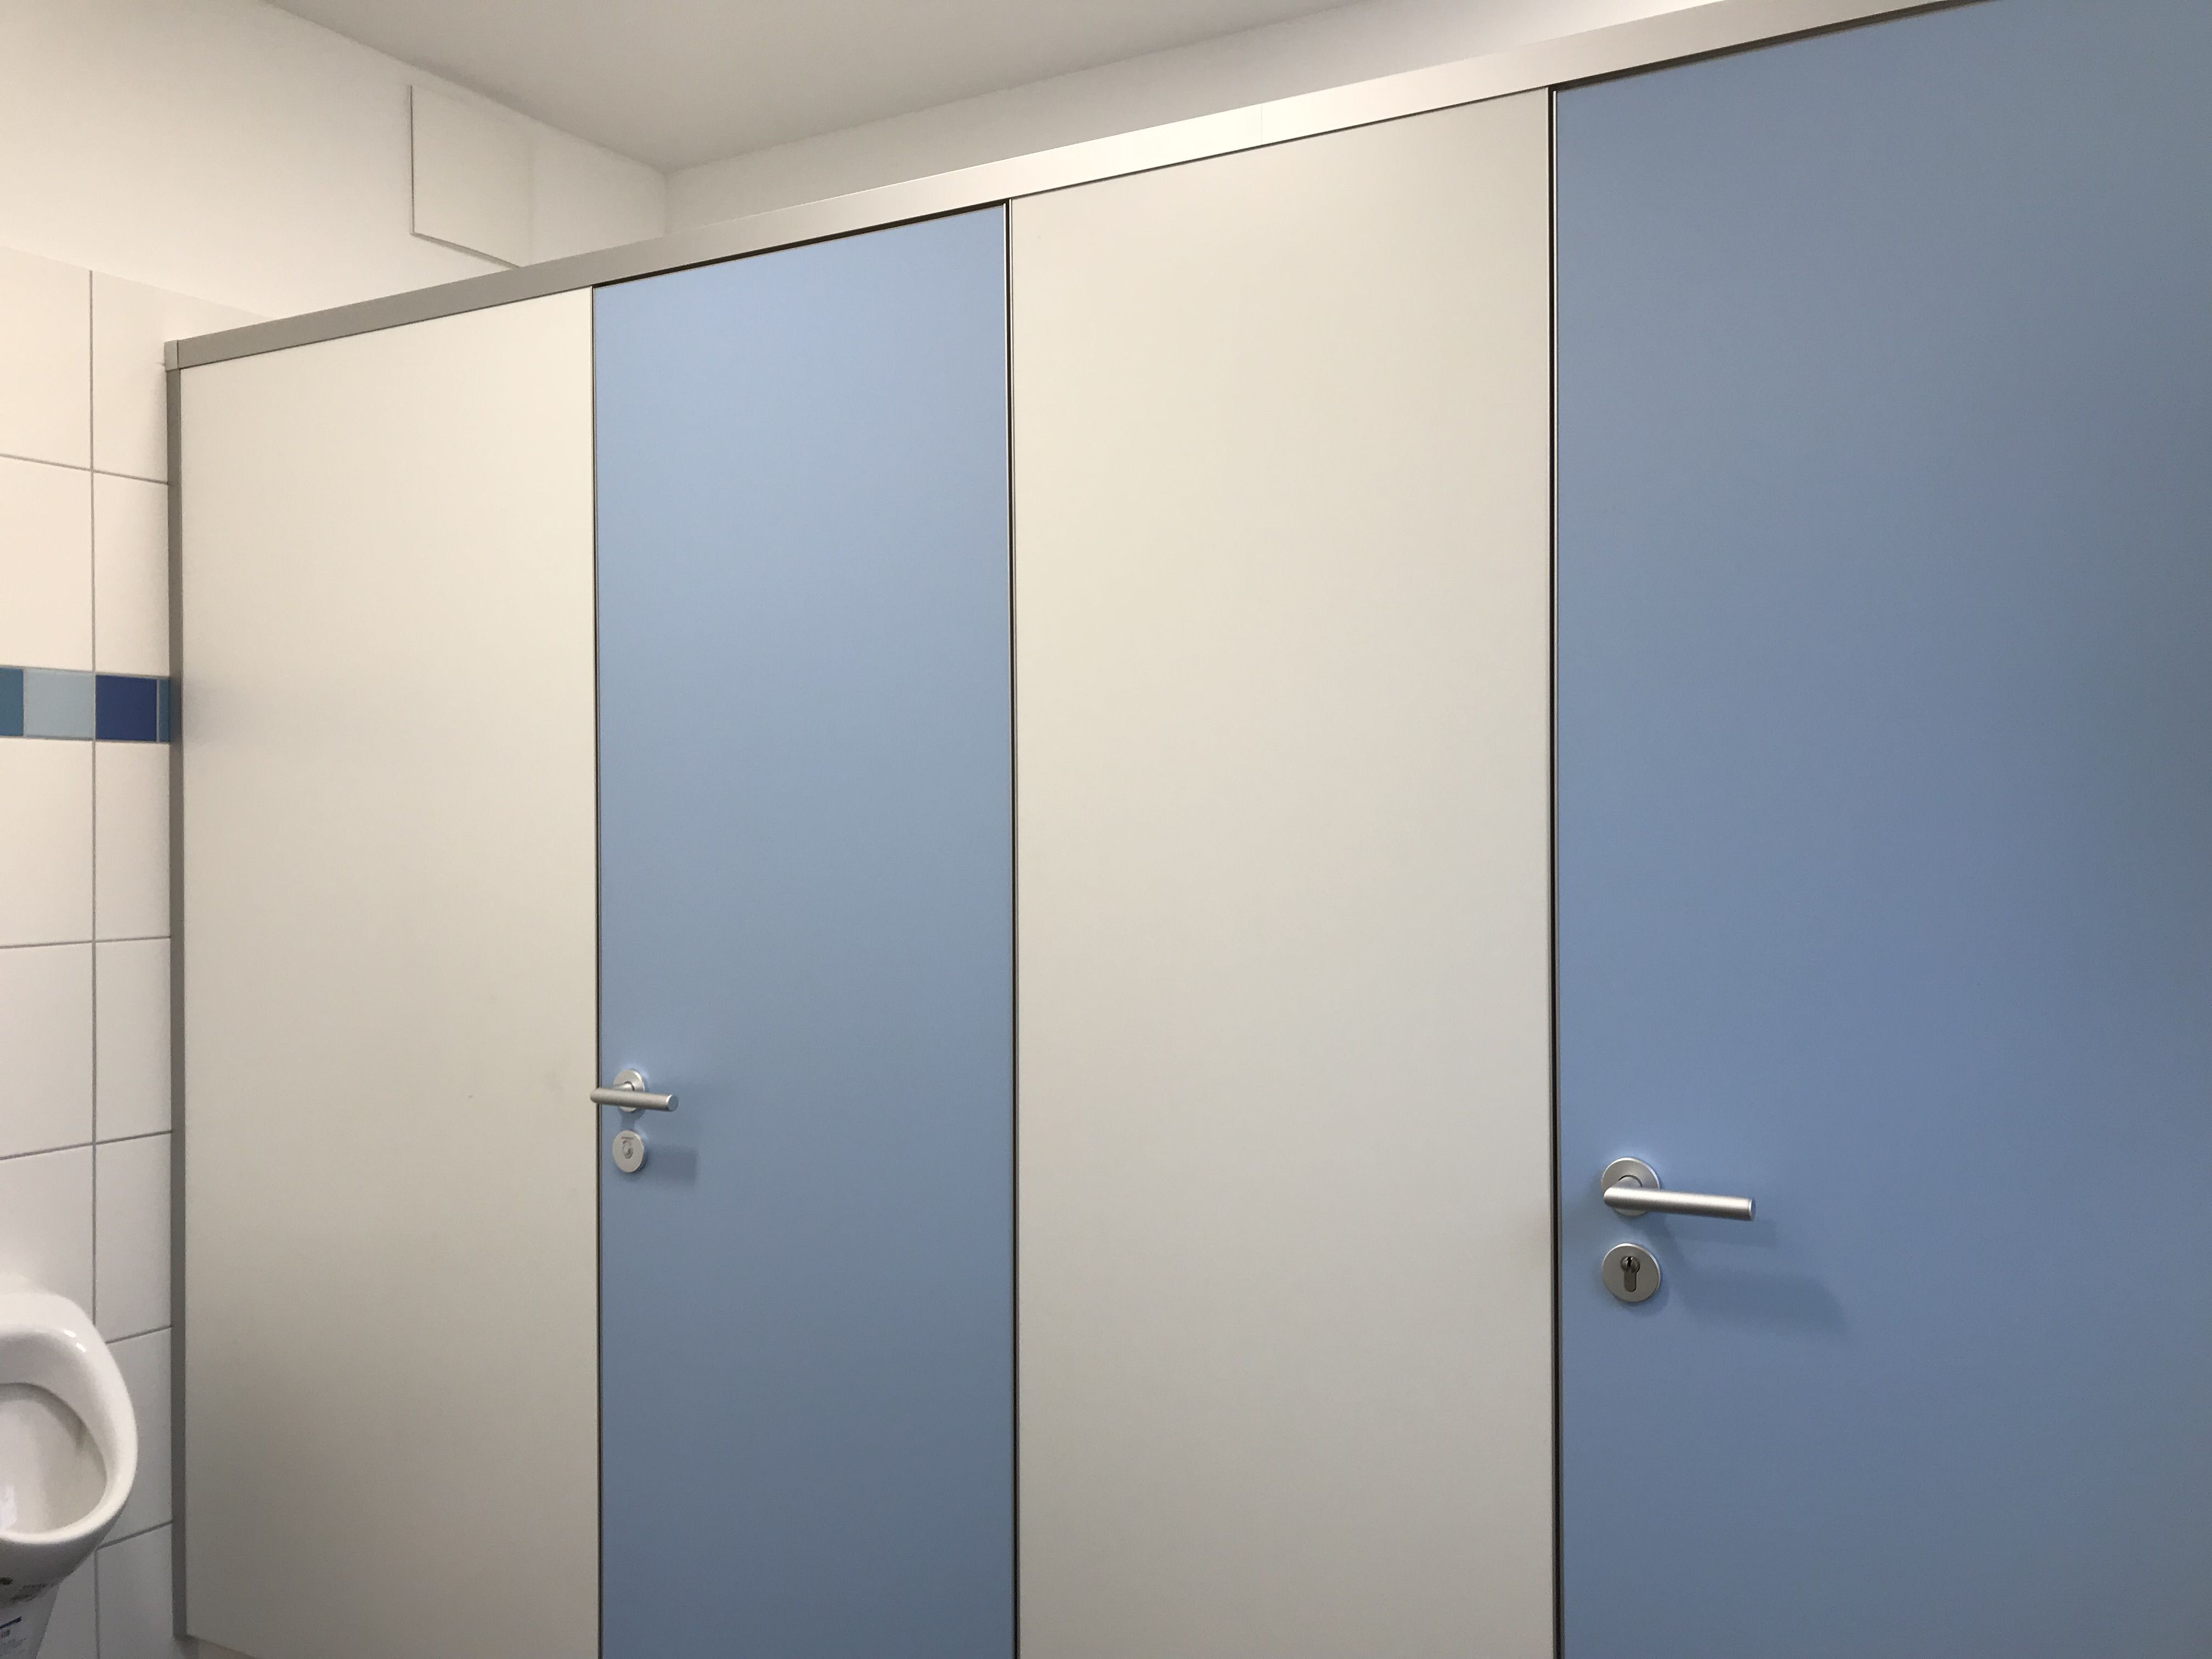 farbgestaltung: wandfarbe verkehrsweiß, türfarbe lagunblau, profile